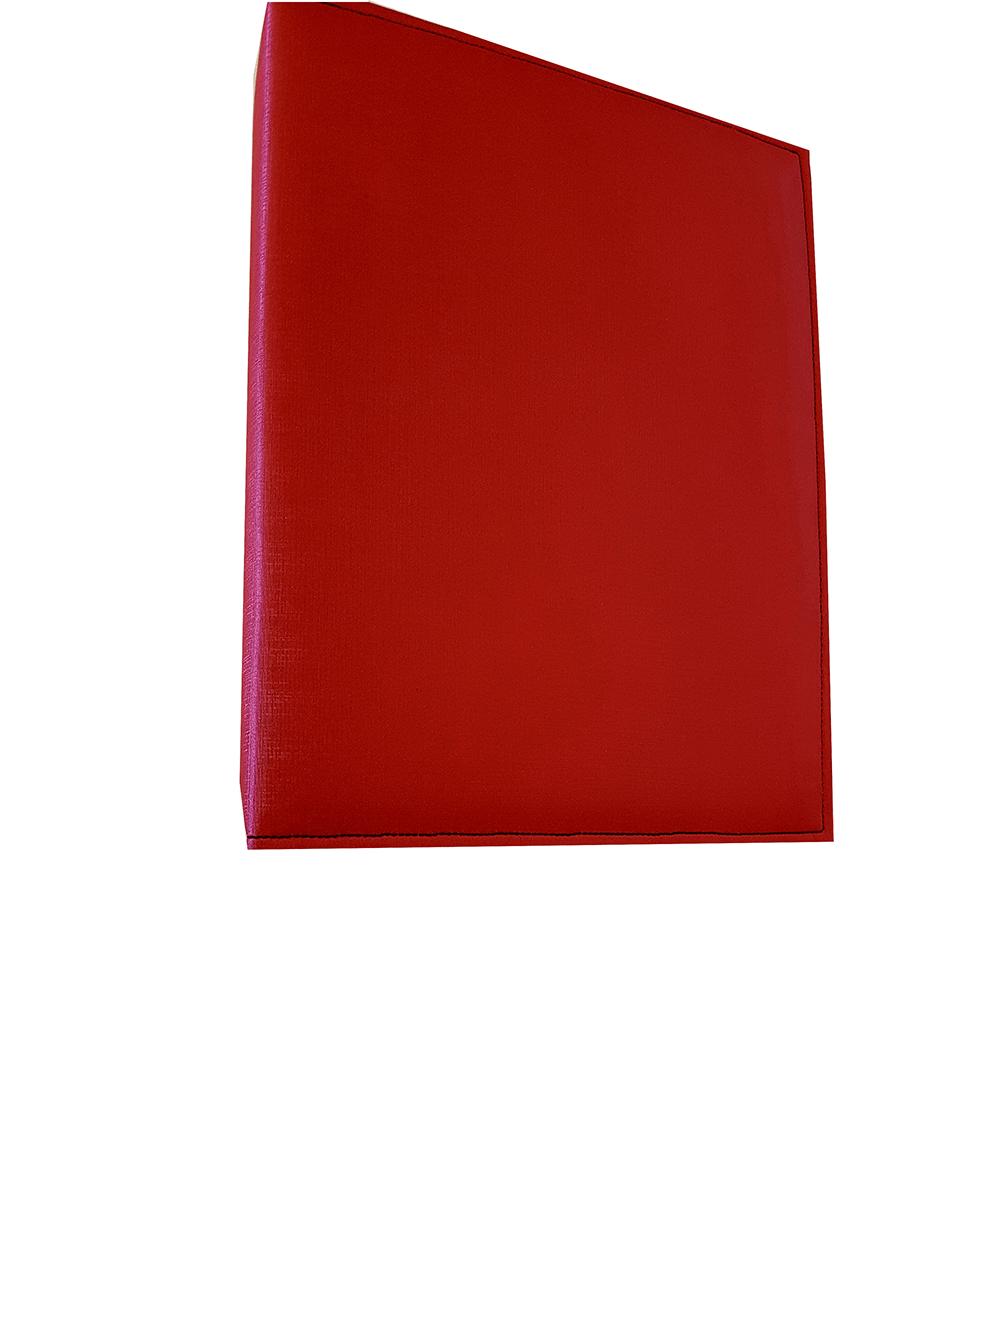 1 Alb. Cour Costurad 10x15/200-300 Ou 15x21/100-150 8 Cores